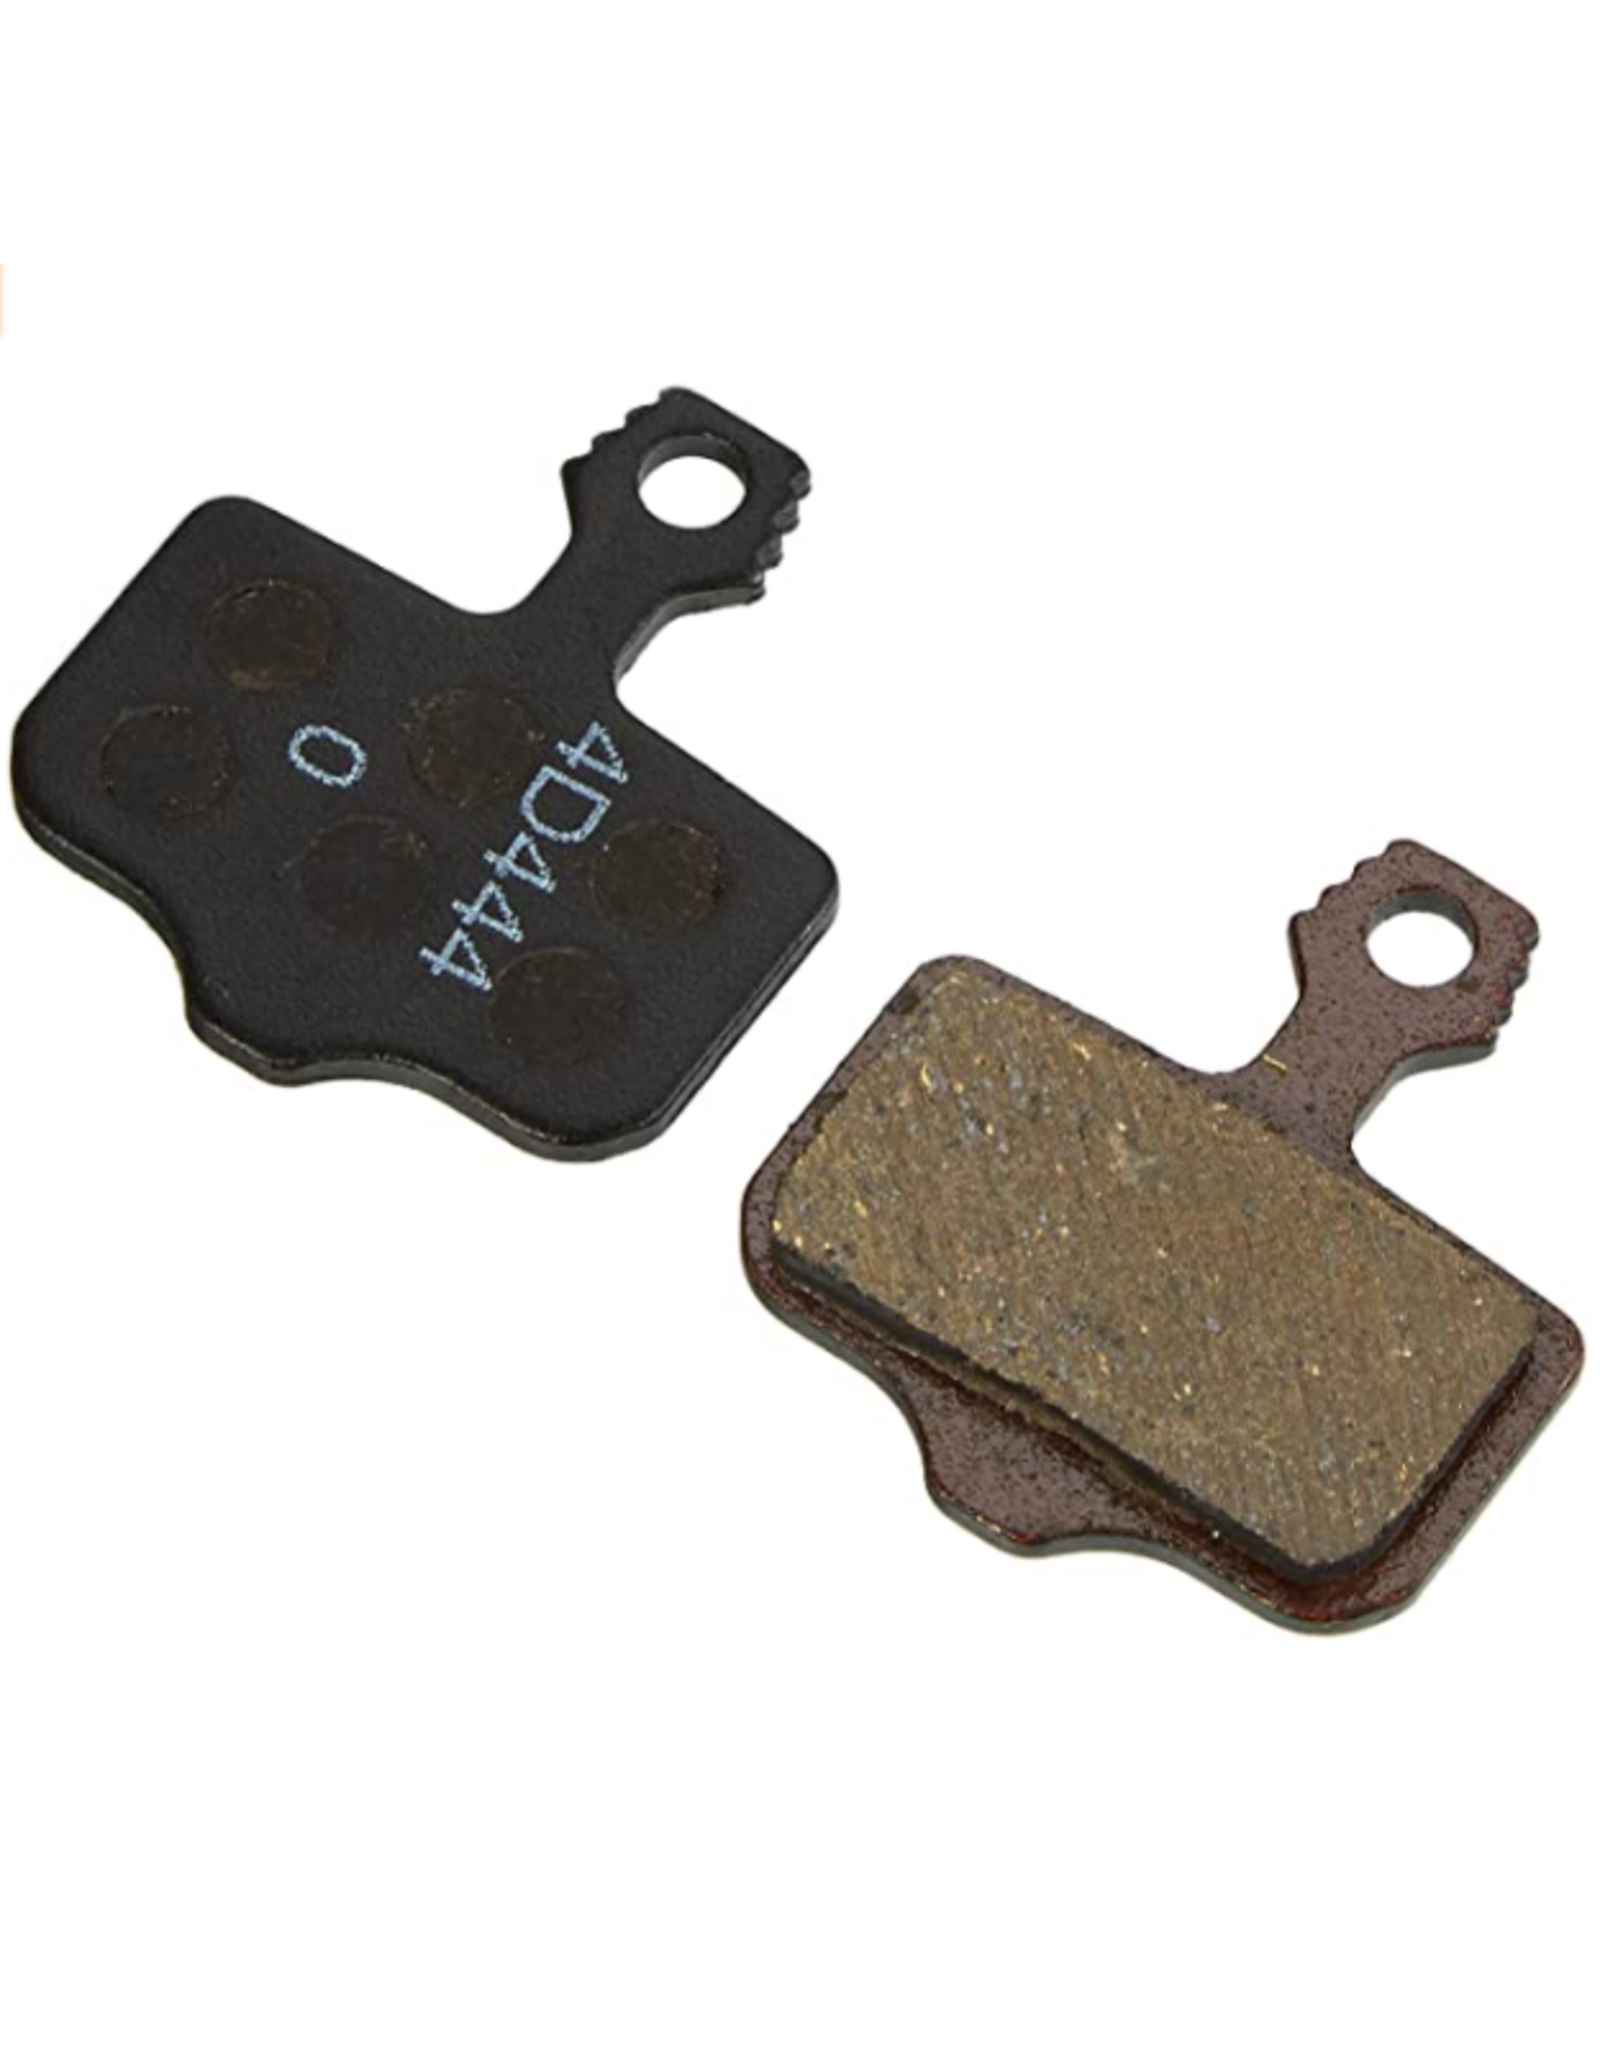 SRAM Brake pads SRAM Level org/acier (vrac)